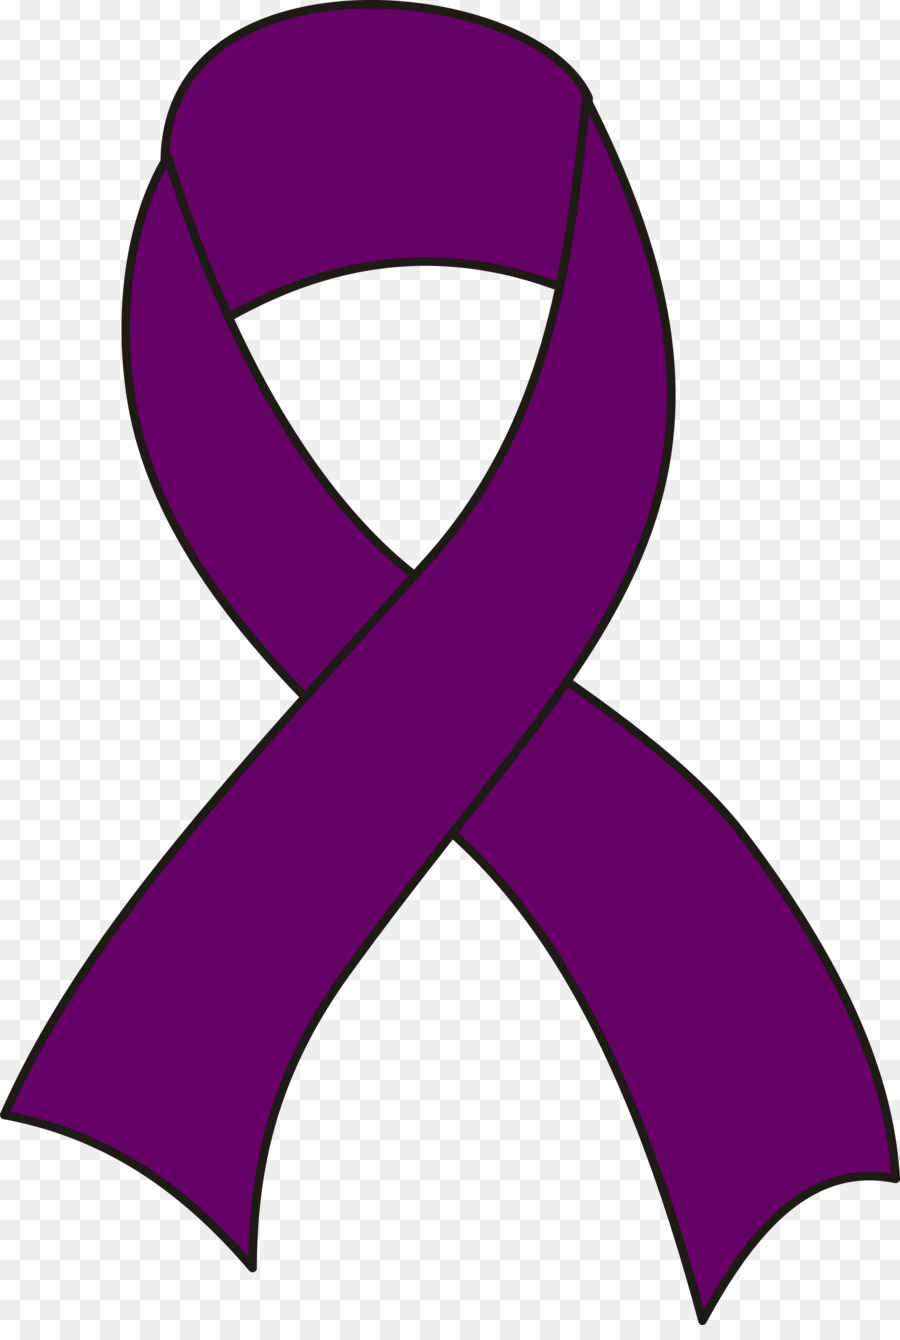 Disease Ribbon